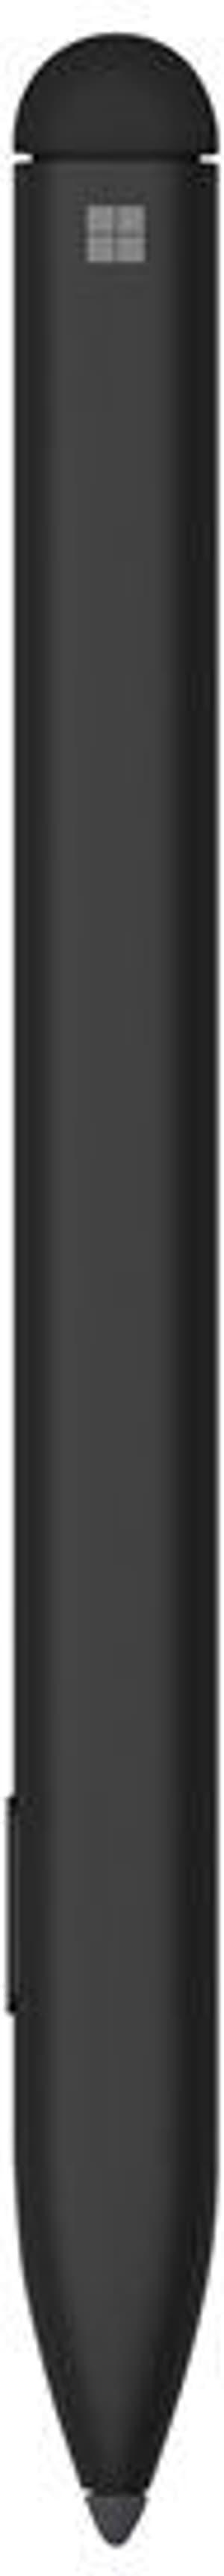 Surface Slim Pen black